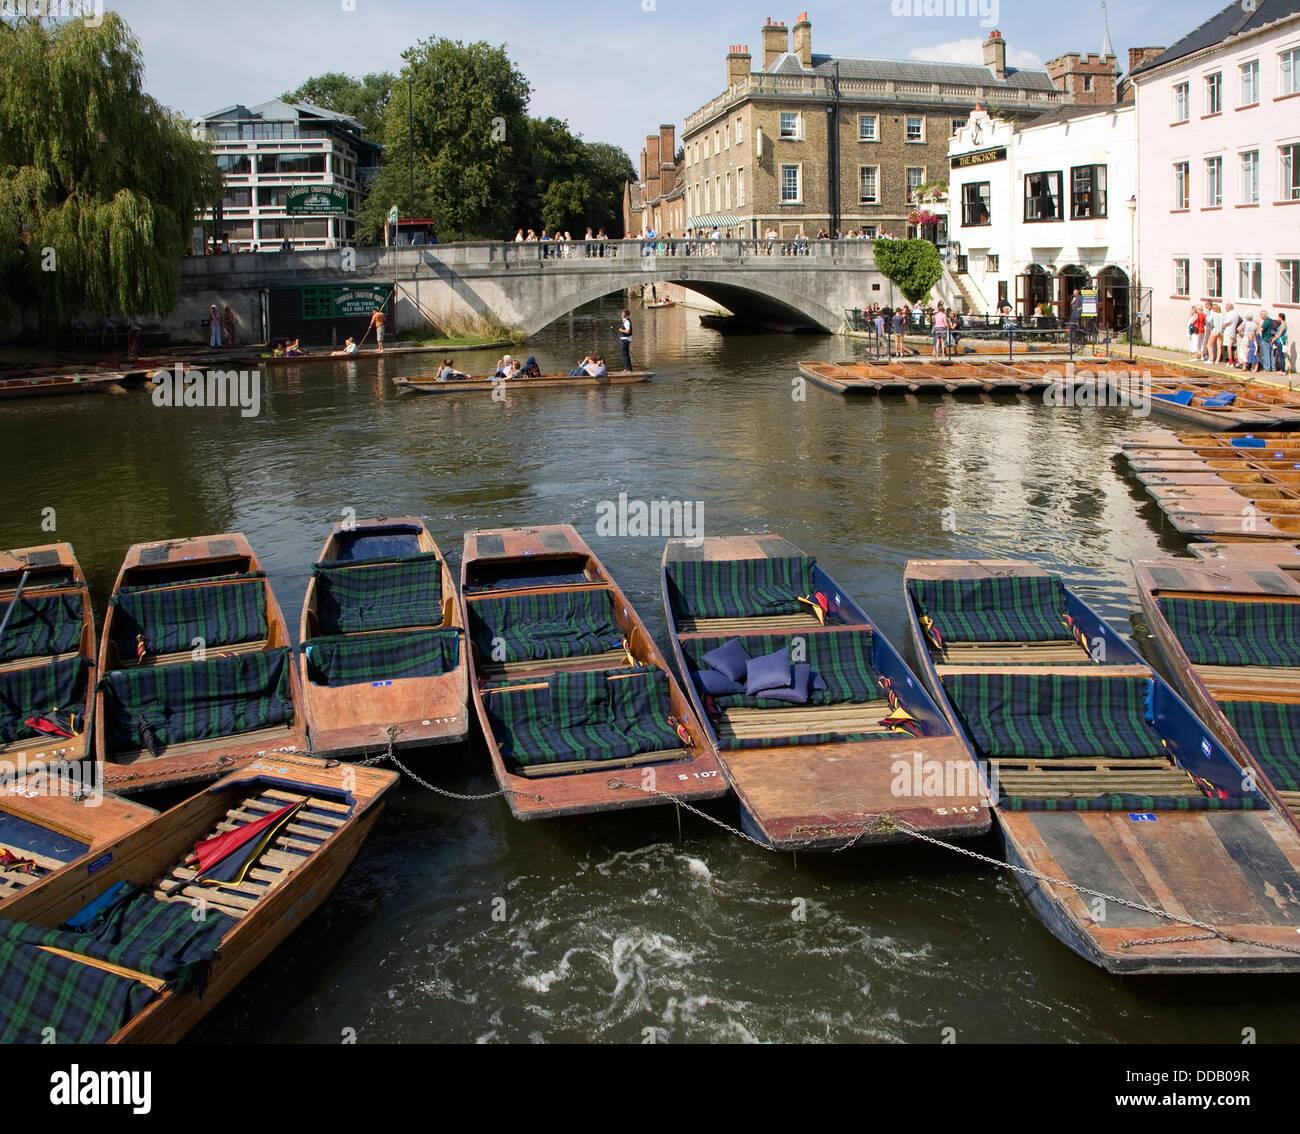 Punts on River Cam by Silver Street Bridge, Cambridge, England, UK - Stock Image